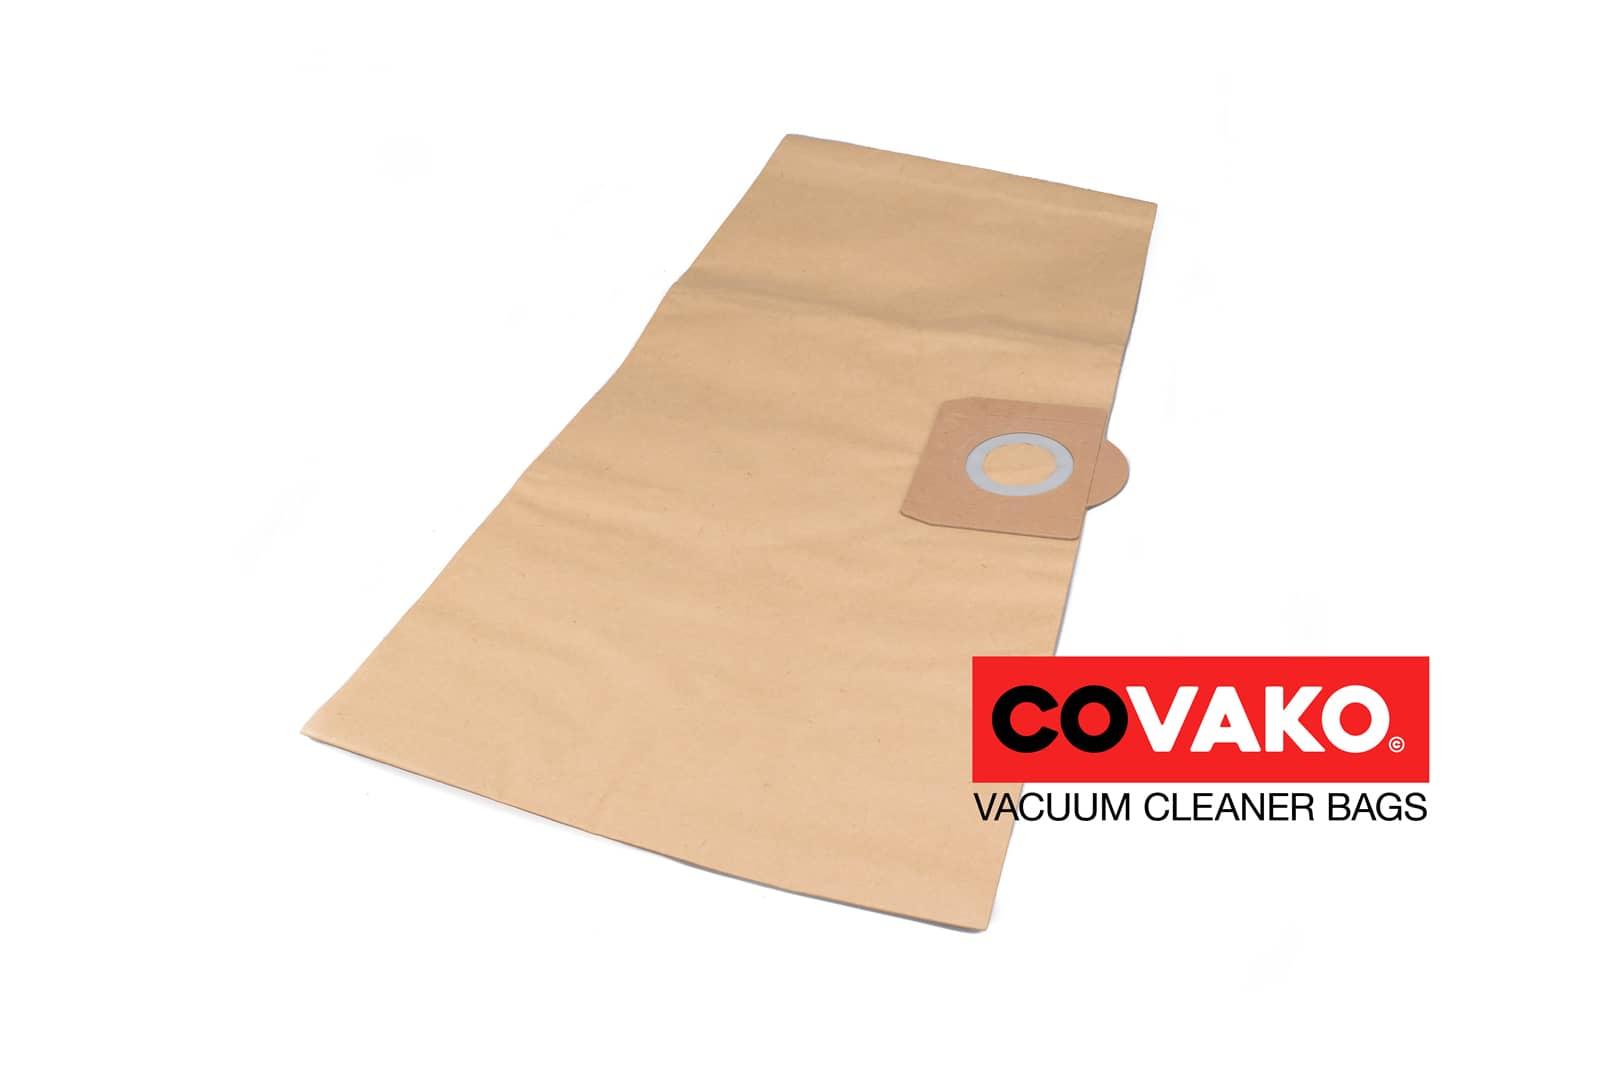 Einhell BT-VC 1500 SA / Papier - Einhell stofzuigerzakken